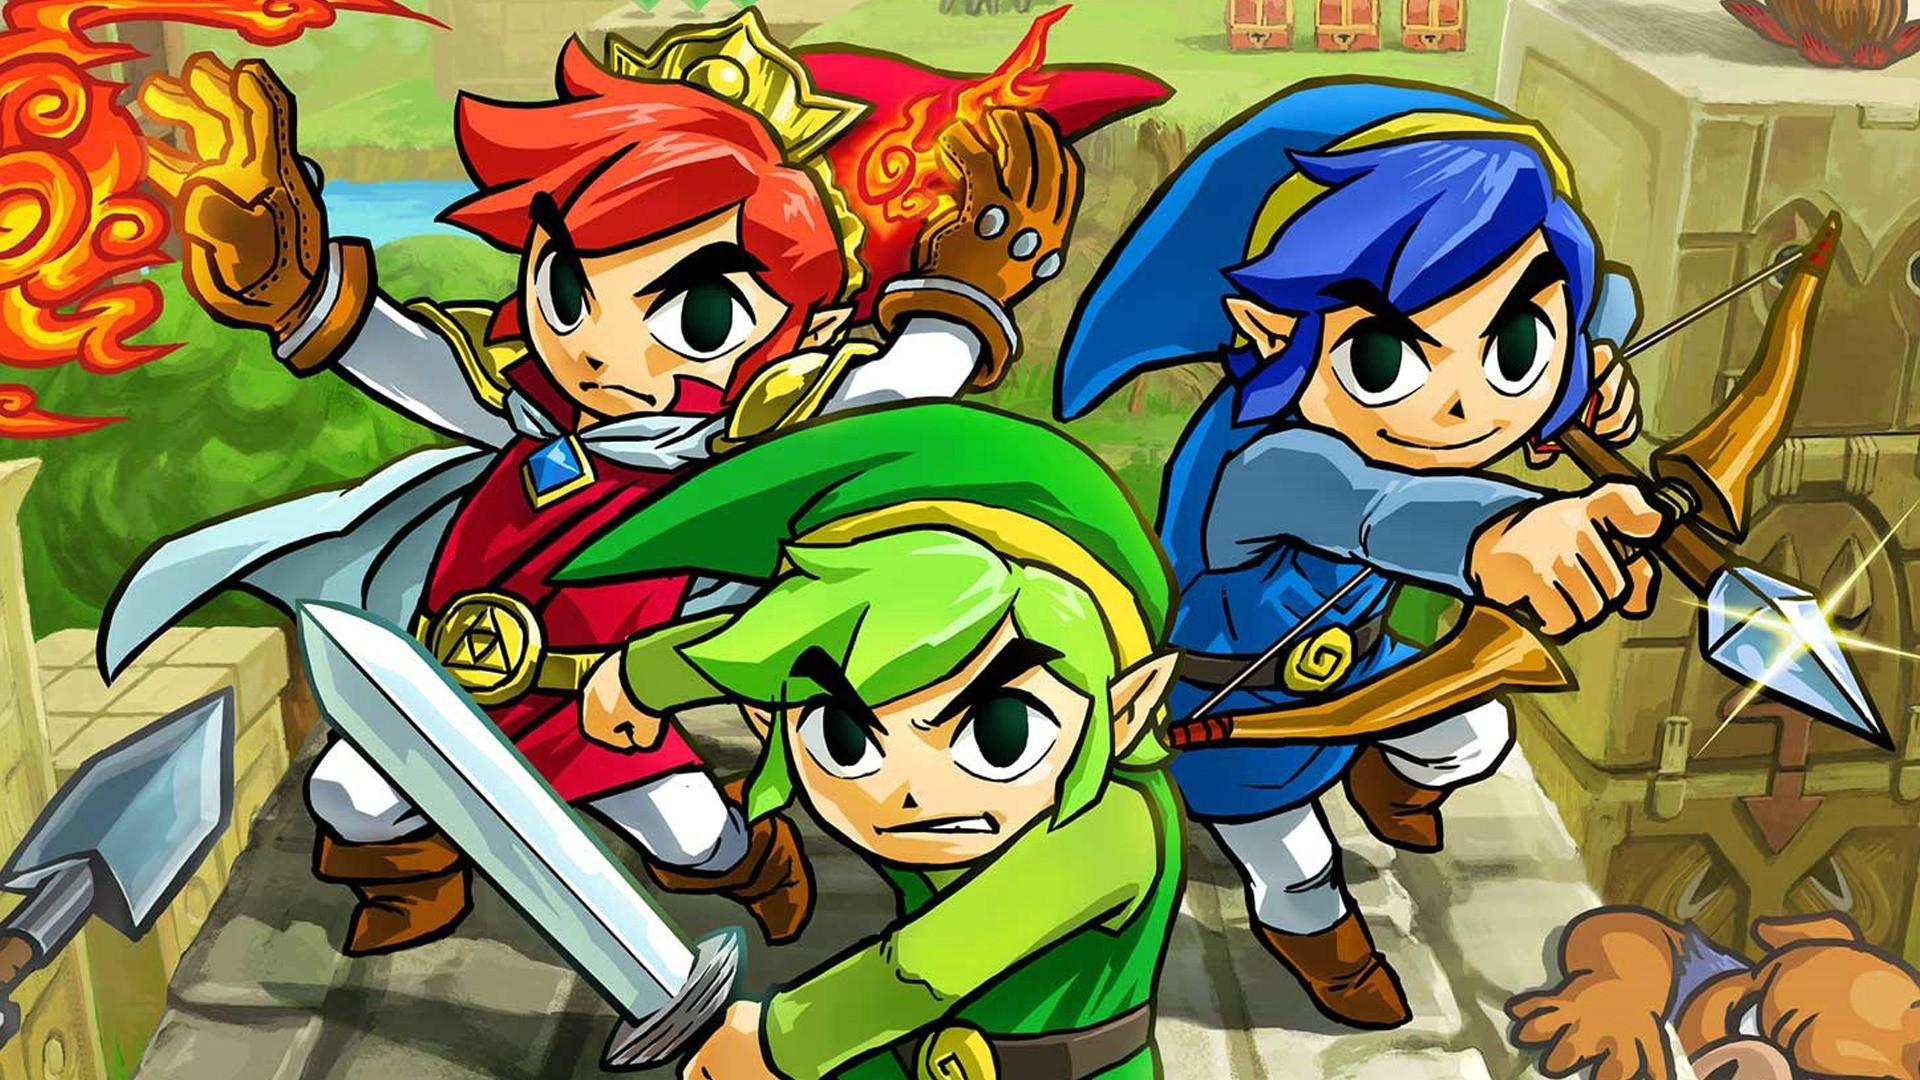 Res: 1920x1080, Zelda Tri Force Heroes Screenshots